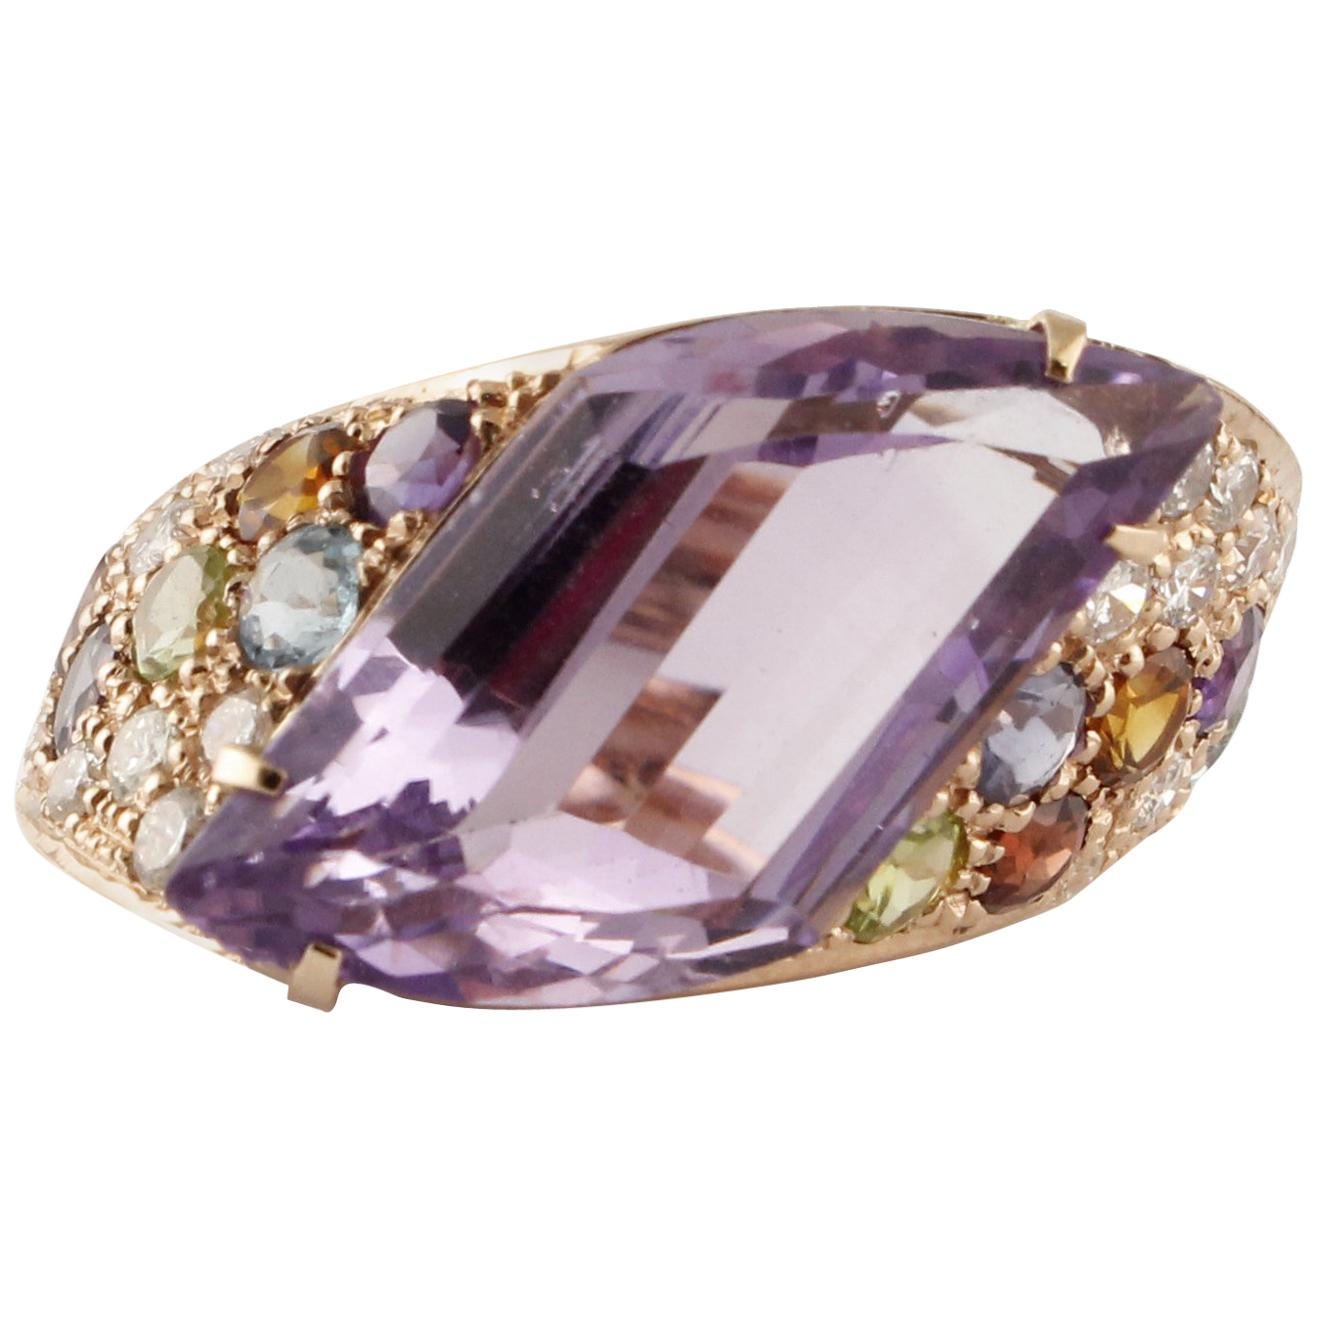 Diamonds Amethyst Peridots Orange Light Blue Topaz Iolite Garnet Rose Gold Ring